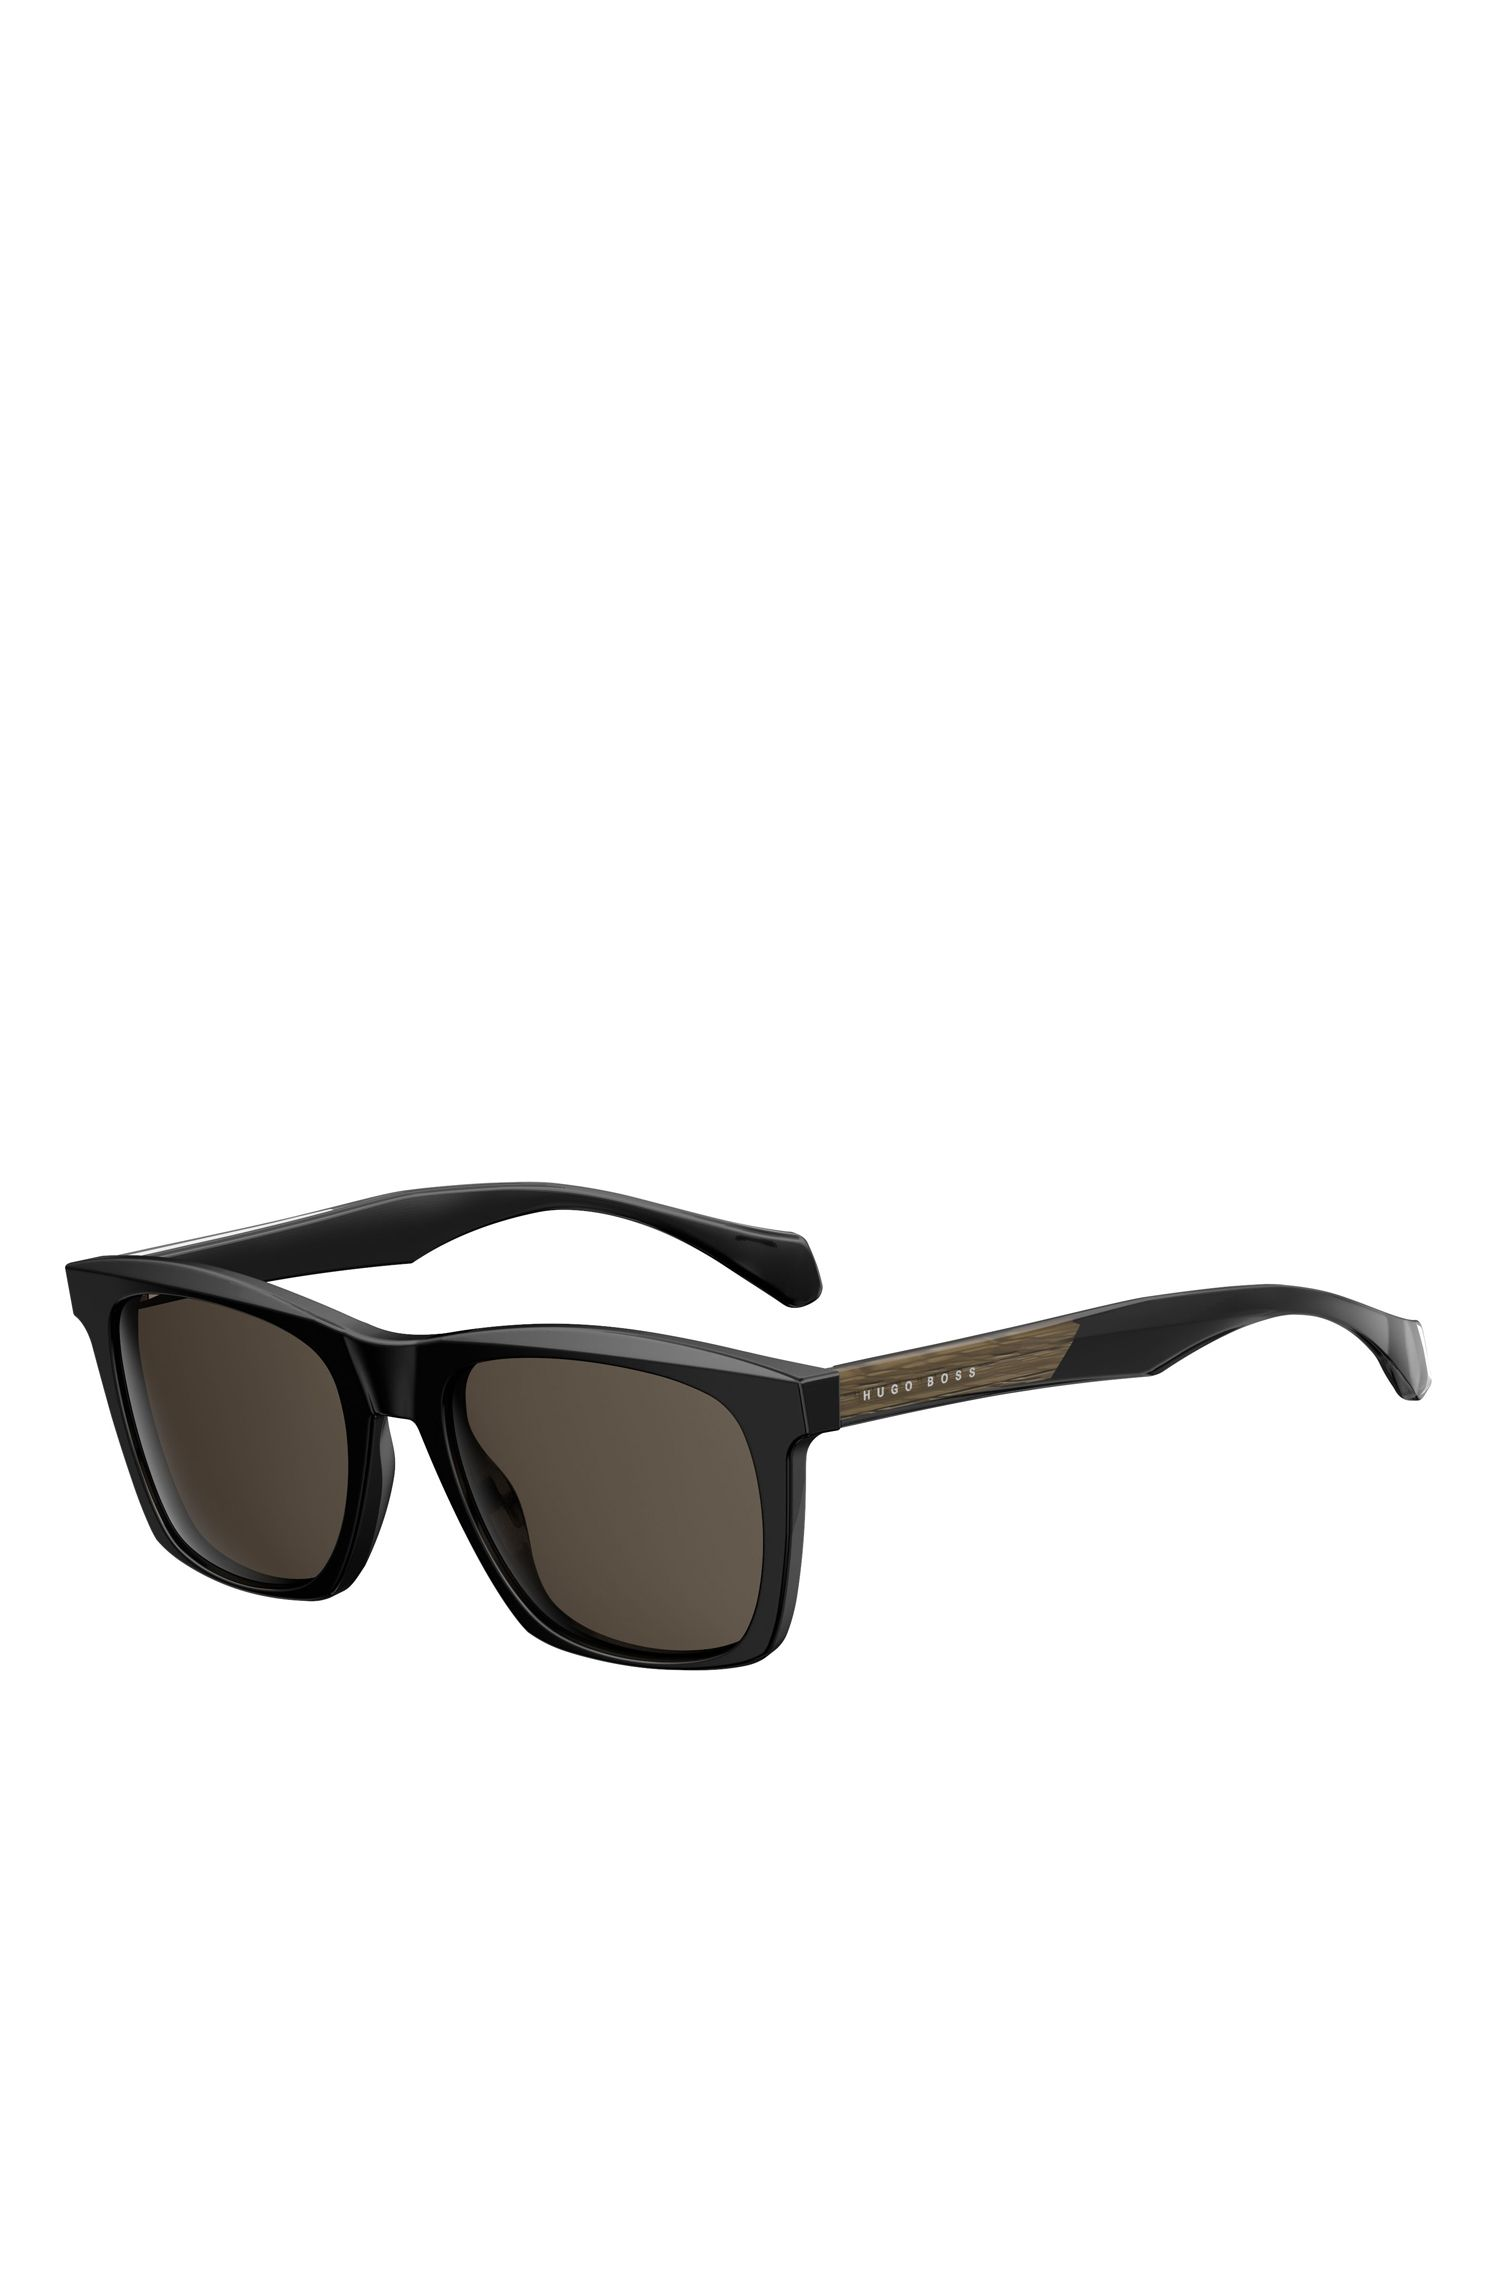 'BOSS 0911/S'   Black Acetate Rectangular Sunglasses